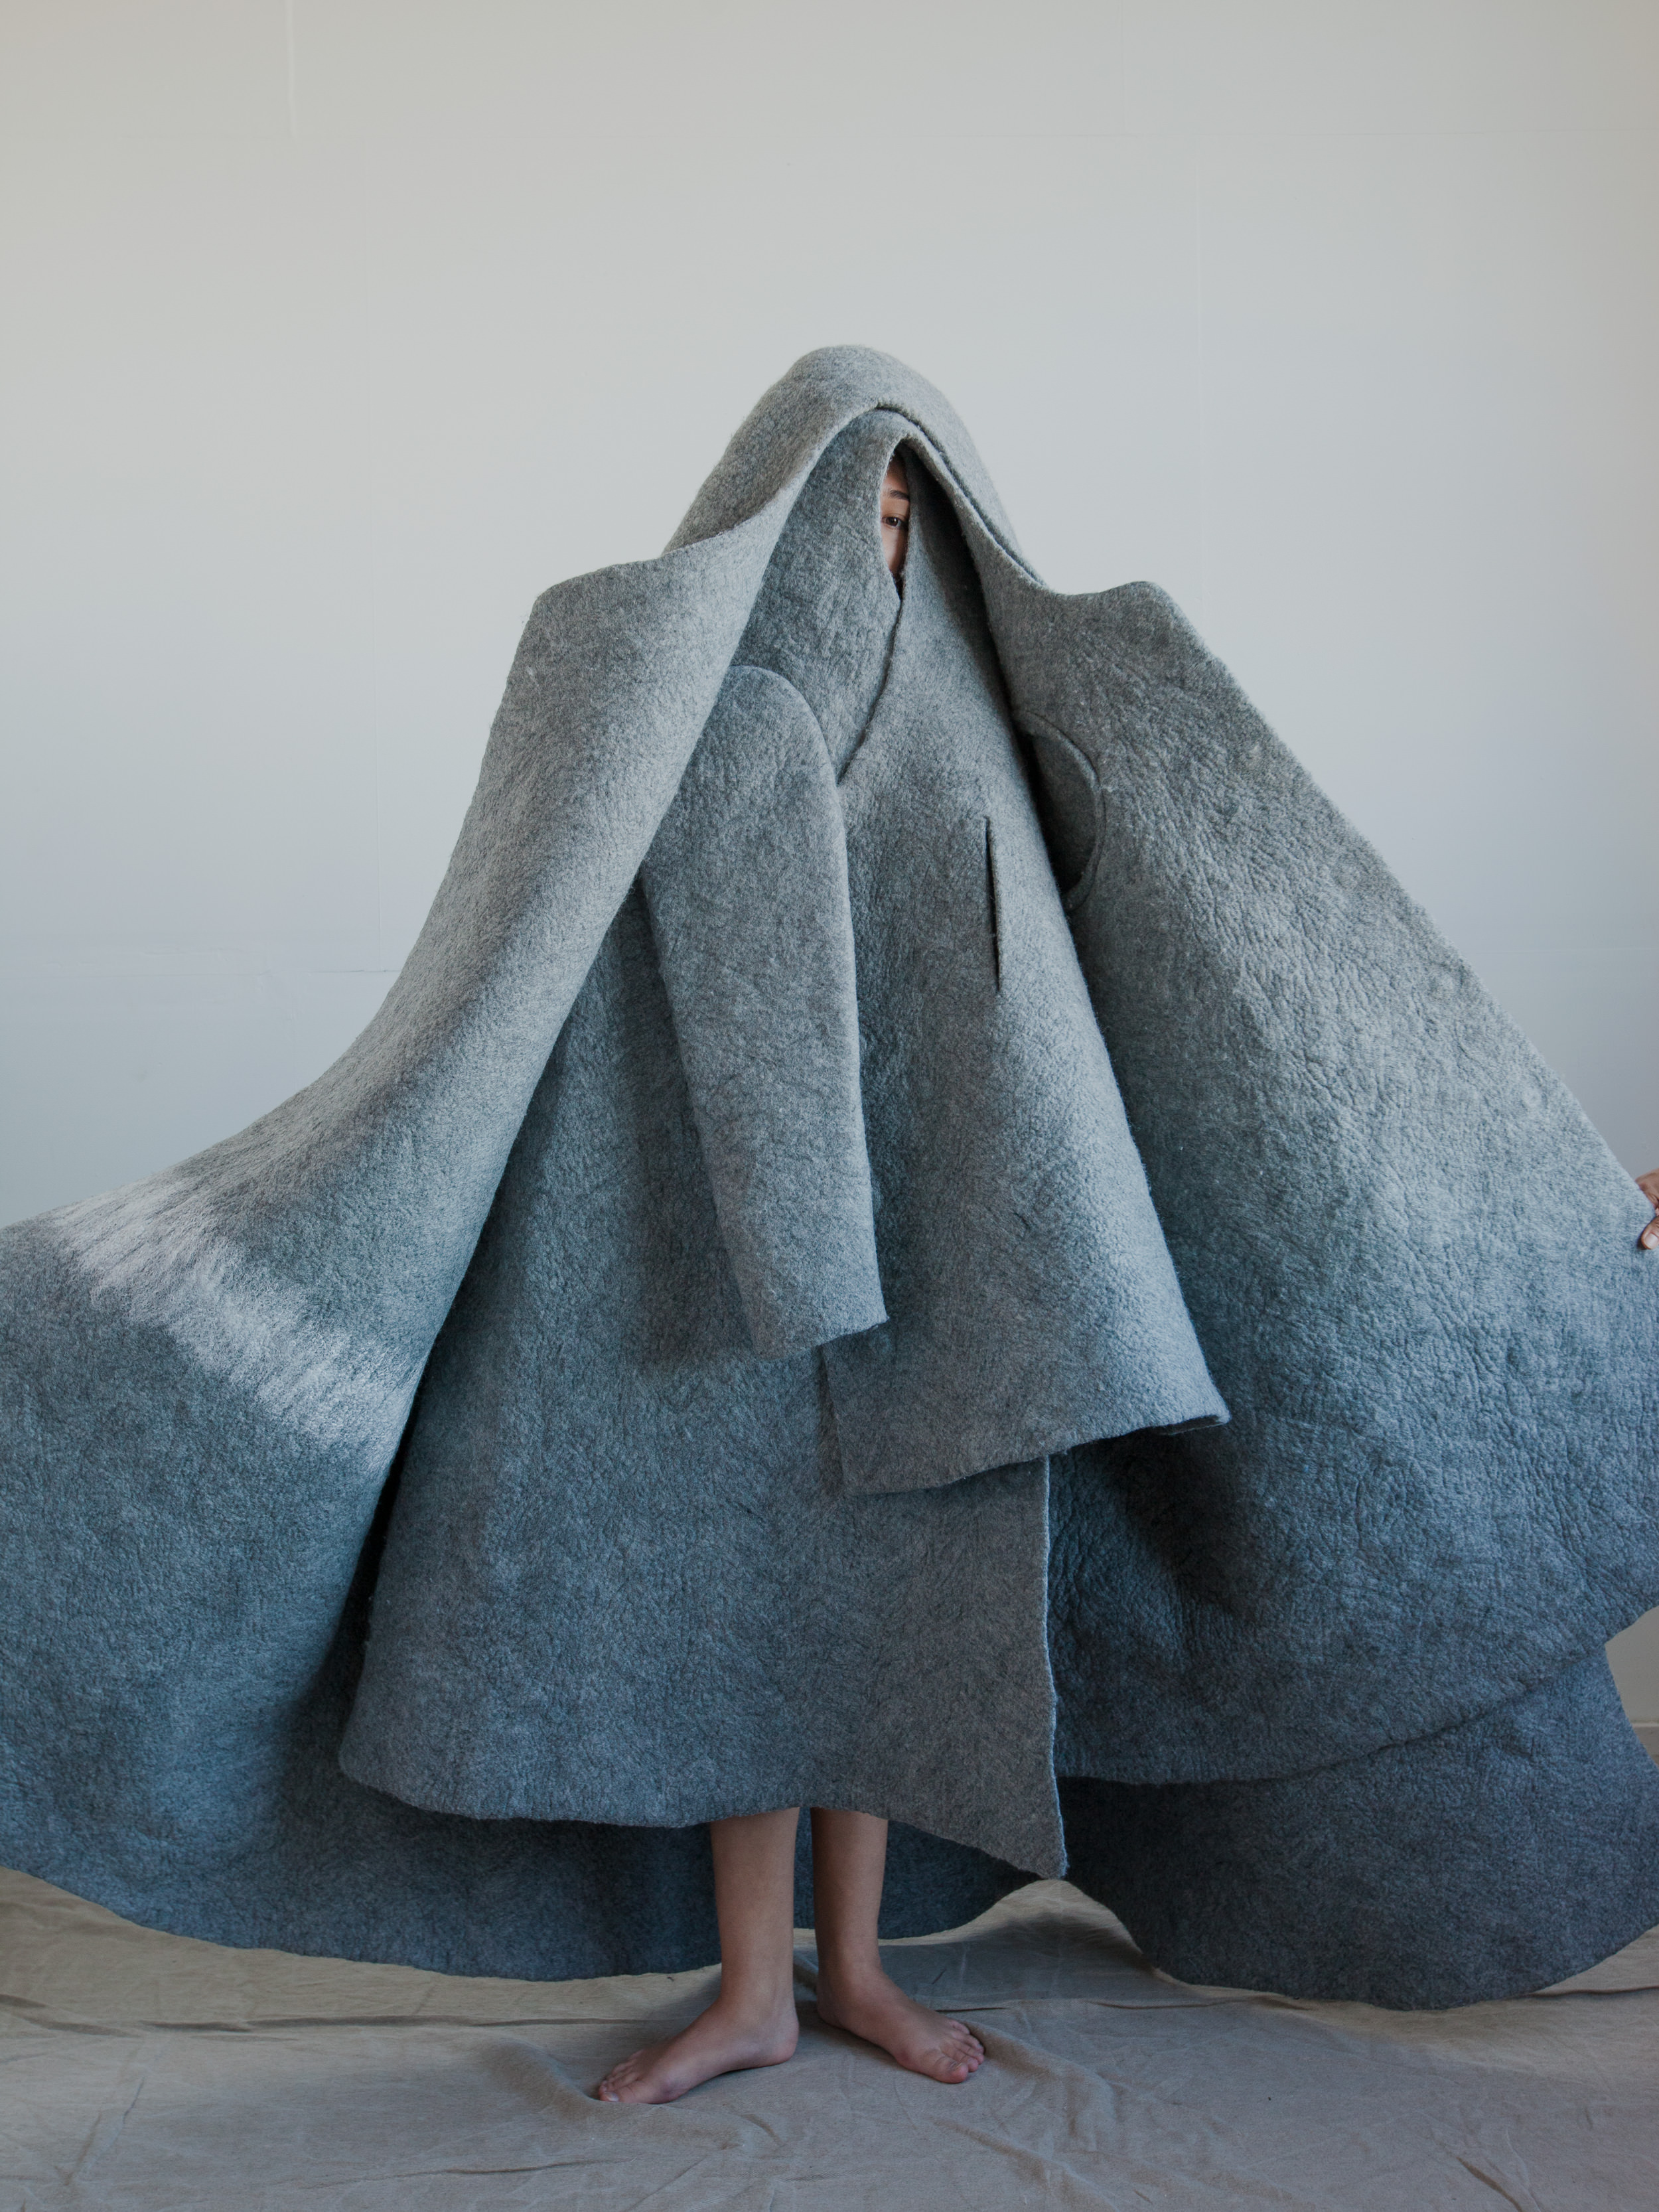 Entirely seamless, the coats are formed and molded by hand using fine Merino wool. Бесшовные пальто сваляны вручную с использованием тонкорунной шерсти Меринос -